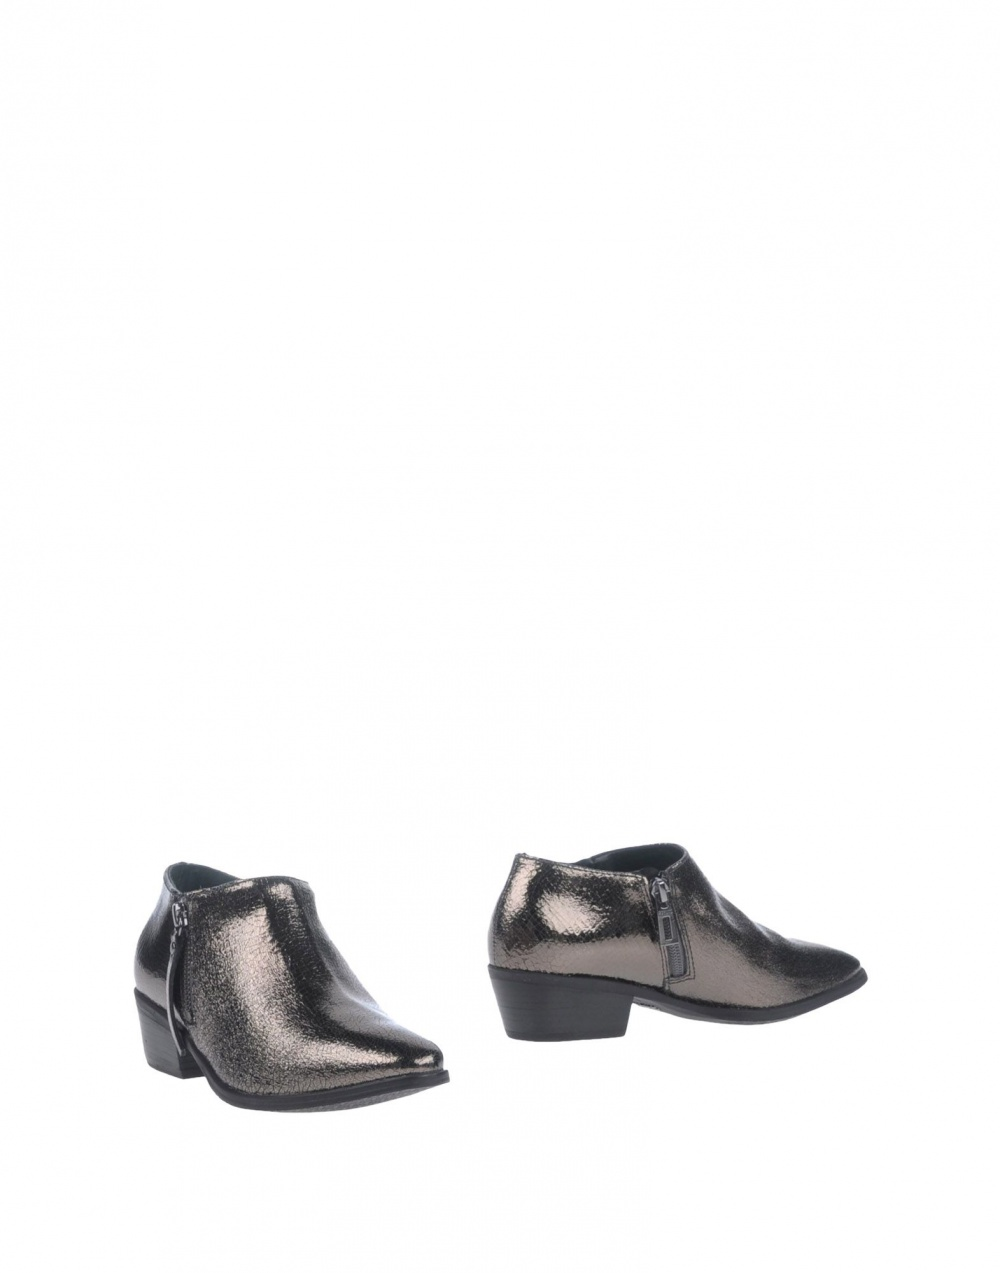 Ботинки Schutz, размер 36,5